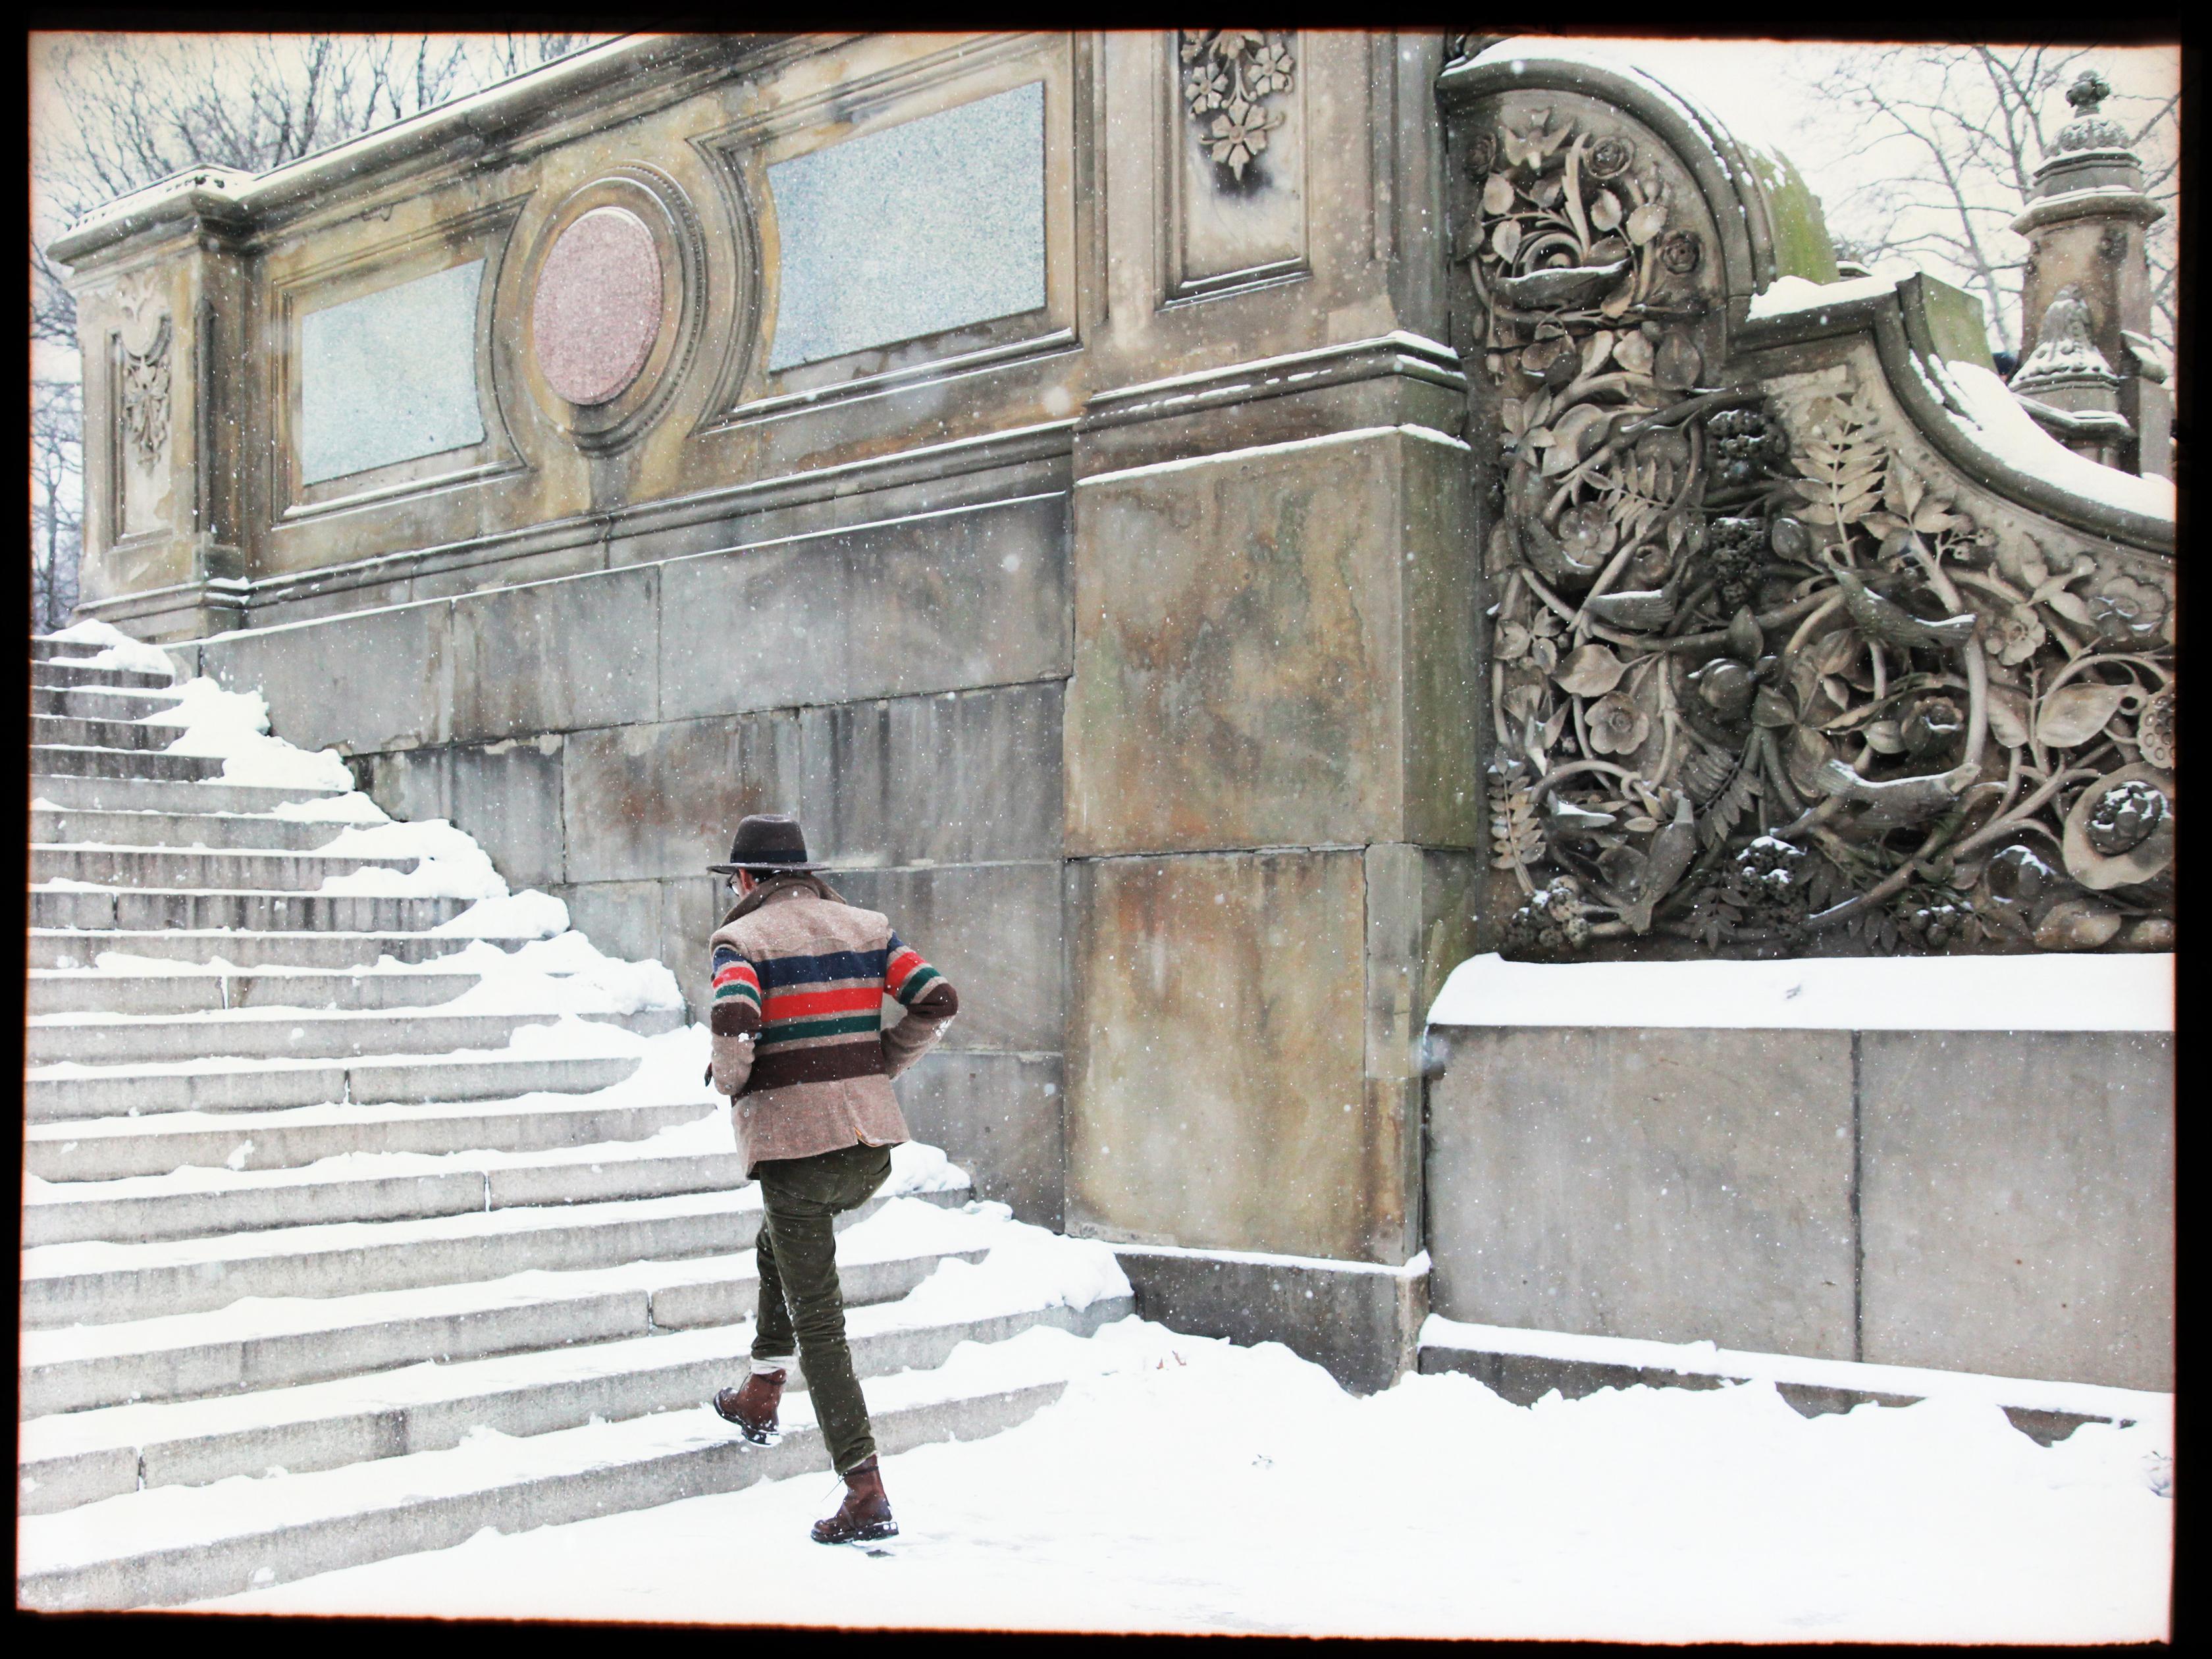 winterwonderland 7